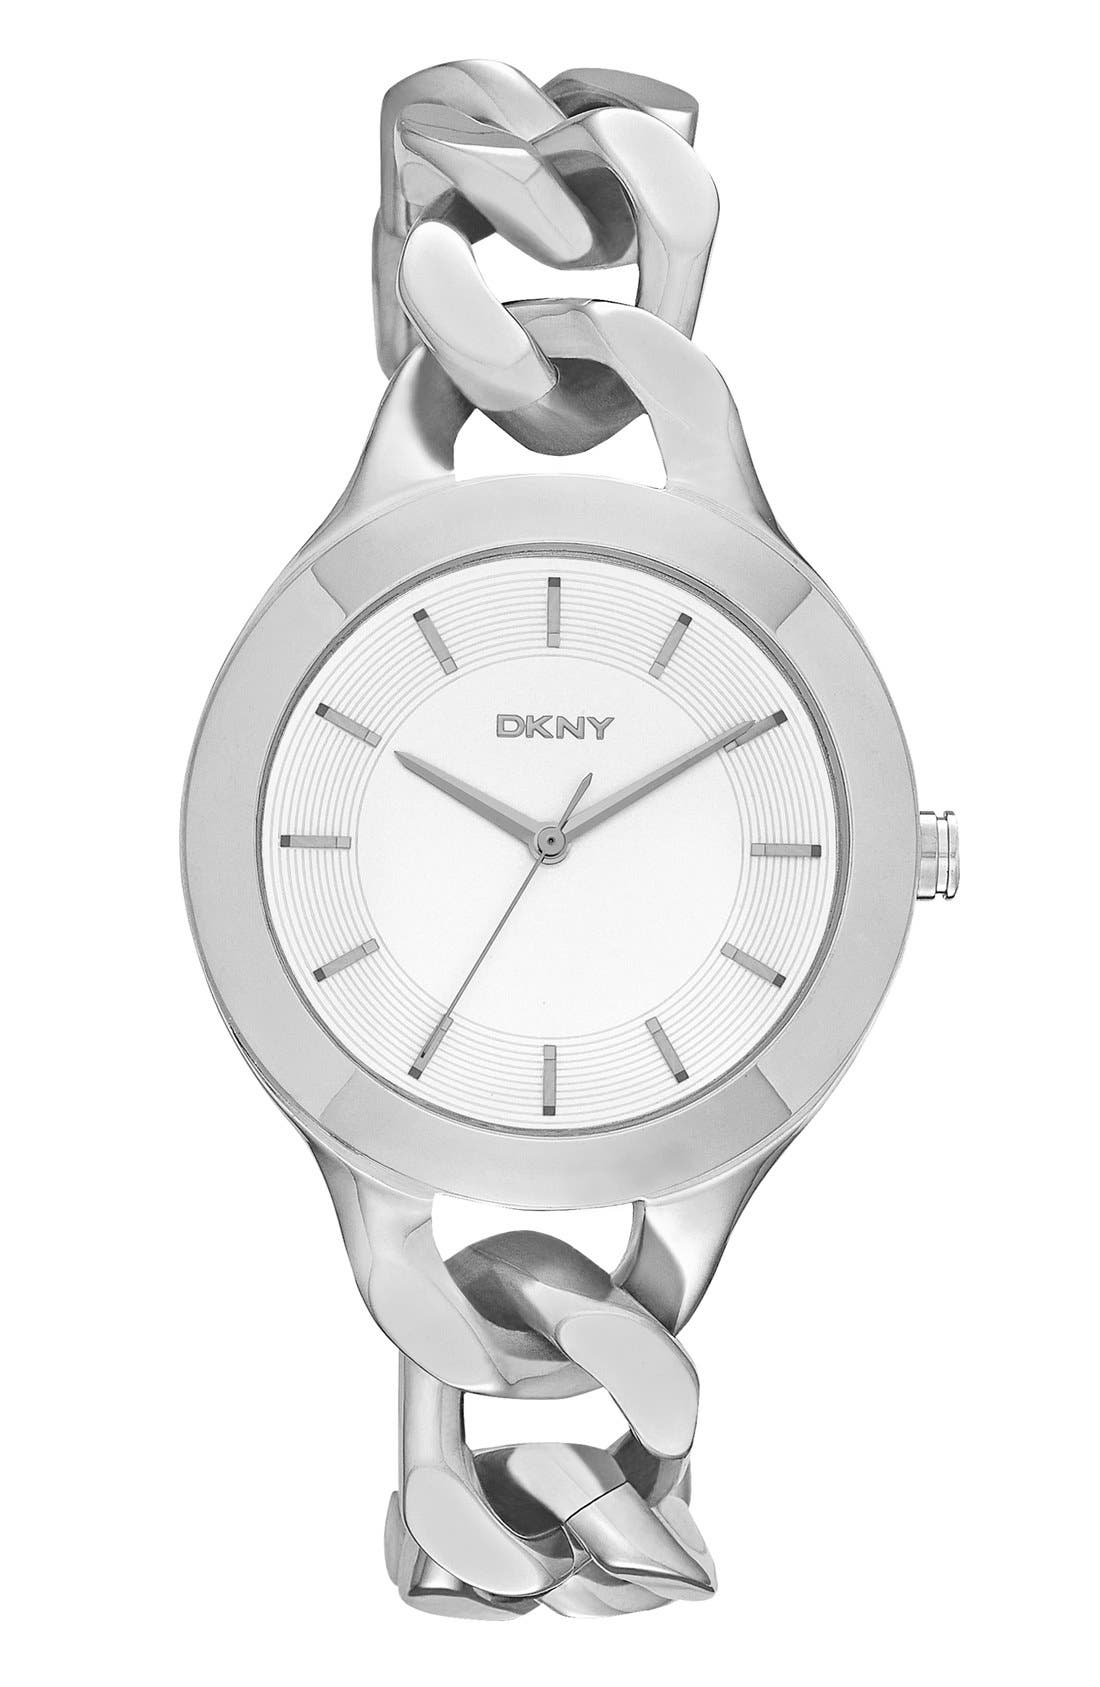 Main Image - DKNY 'Chambers' Round Chain Bracelet Watch, 36mm